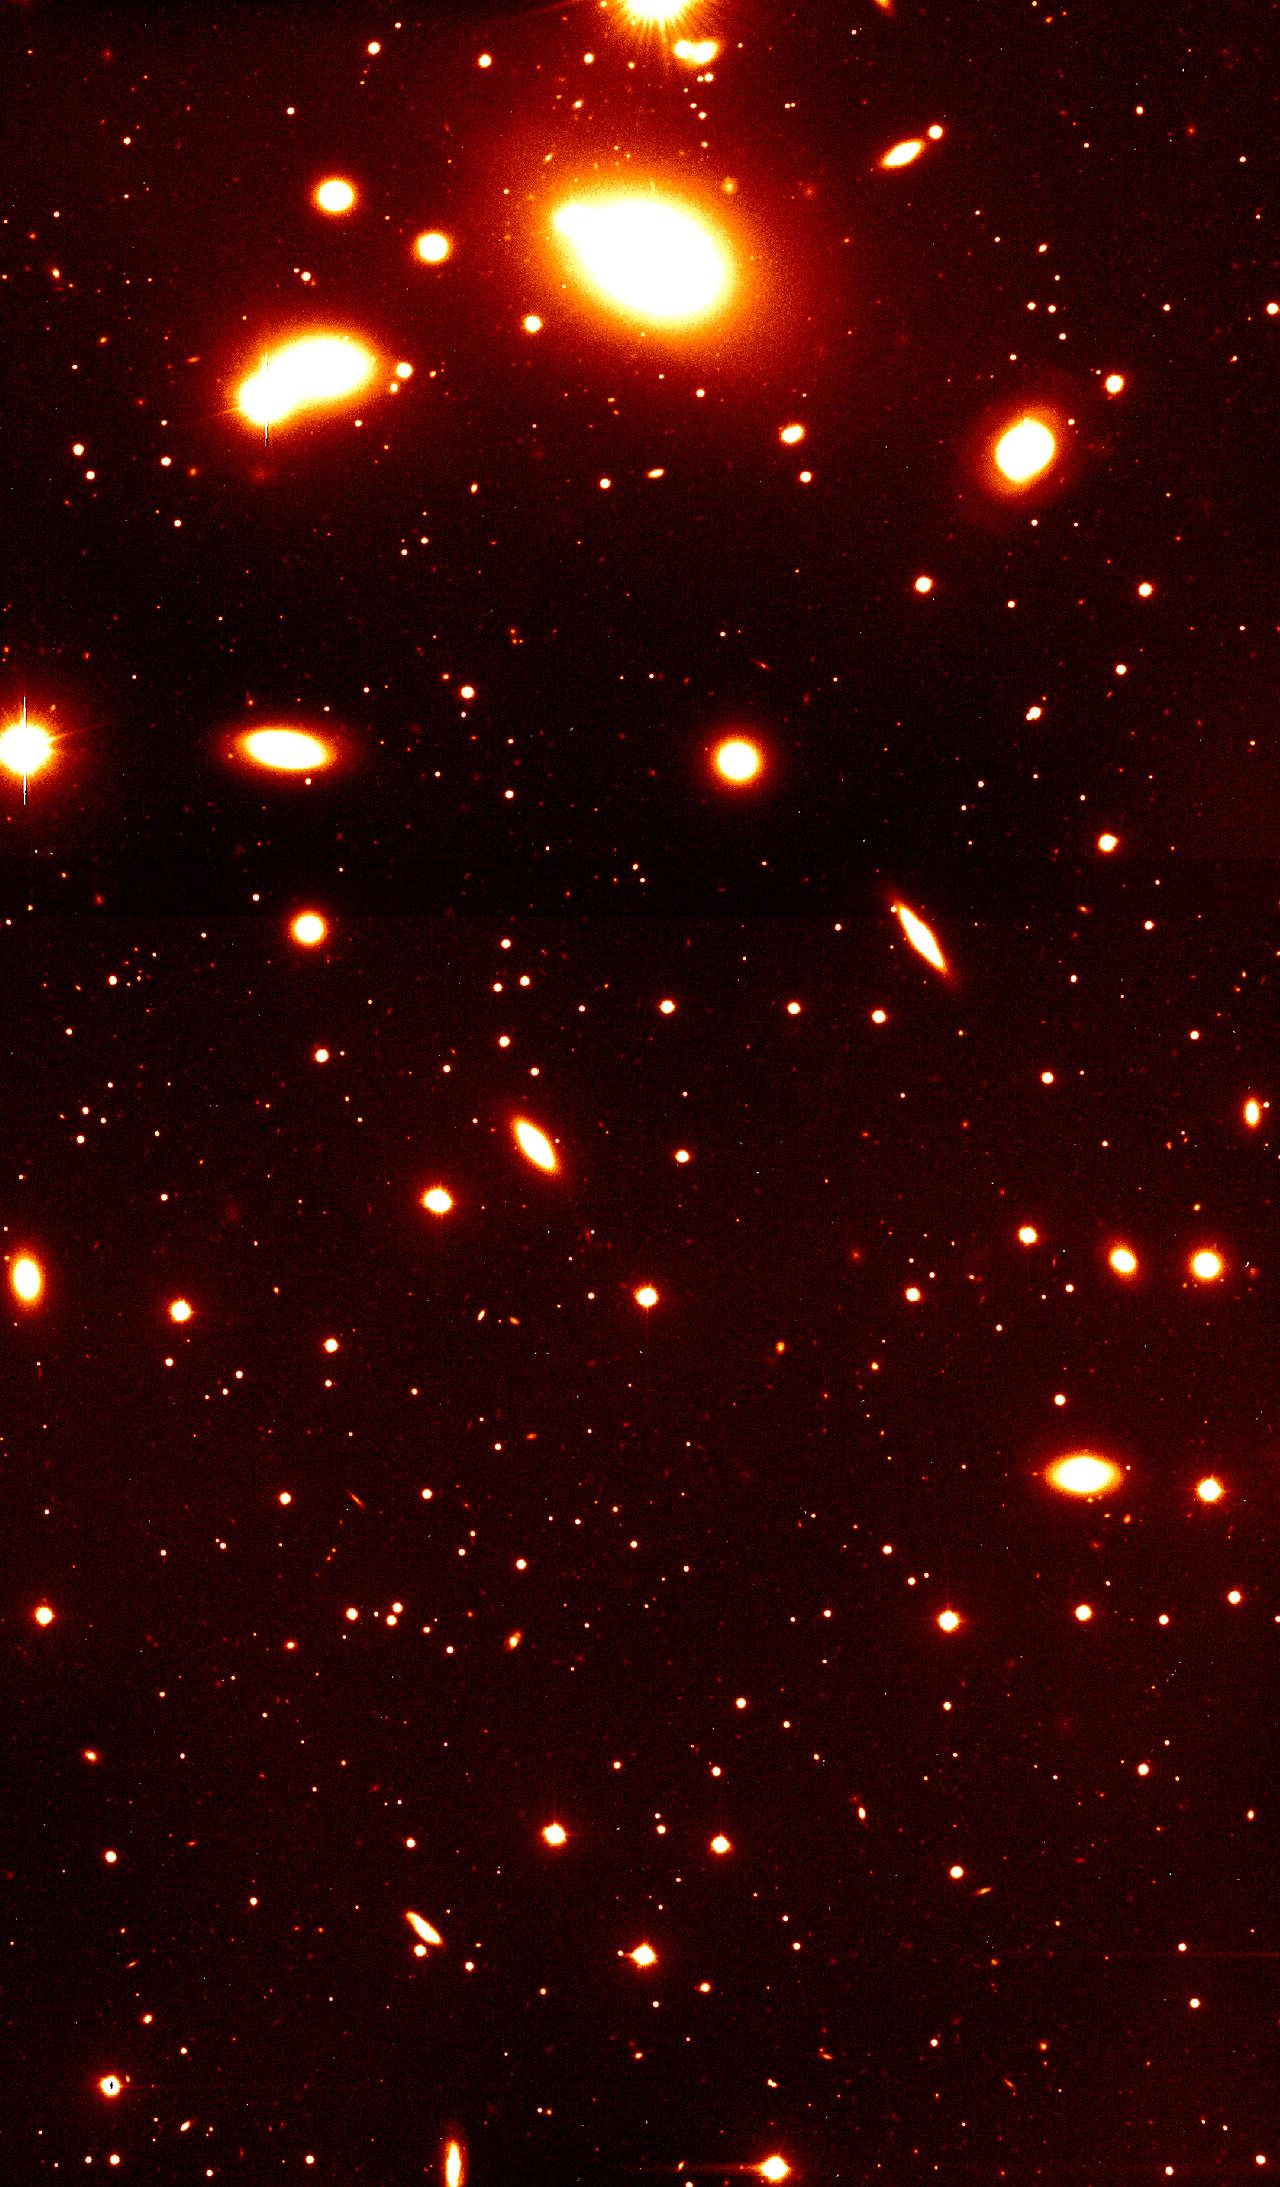 red shift black hole - photo #26